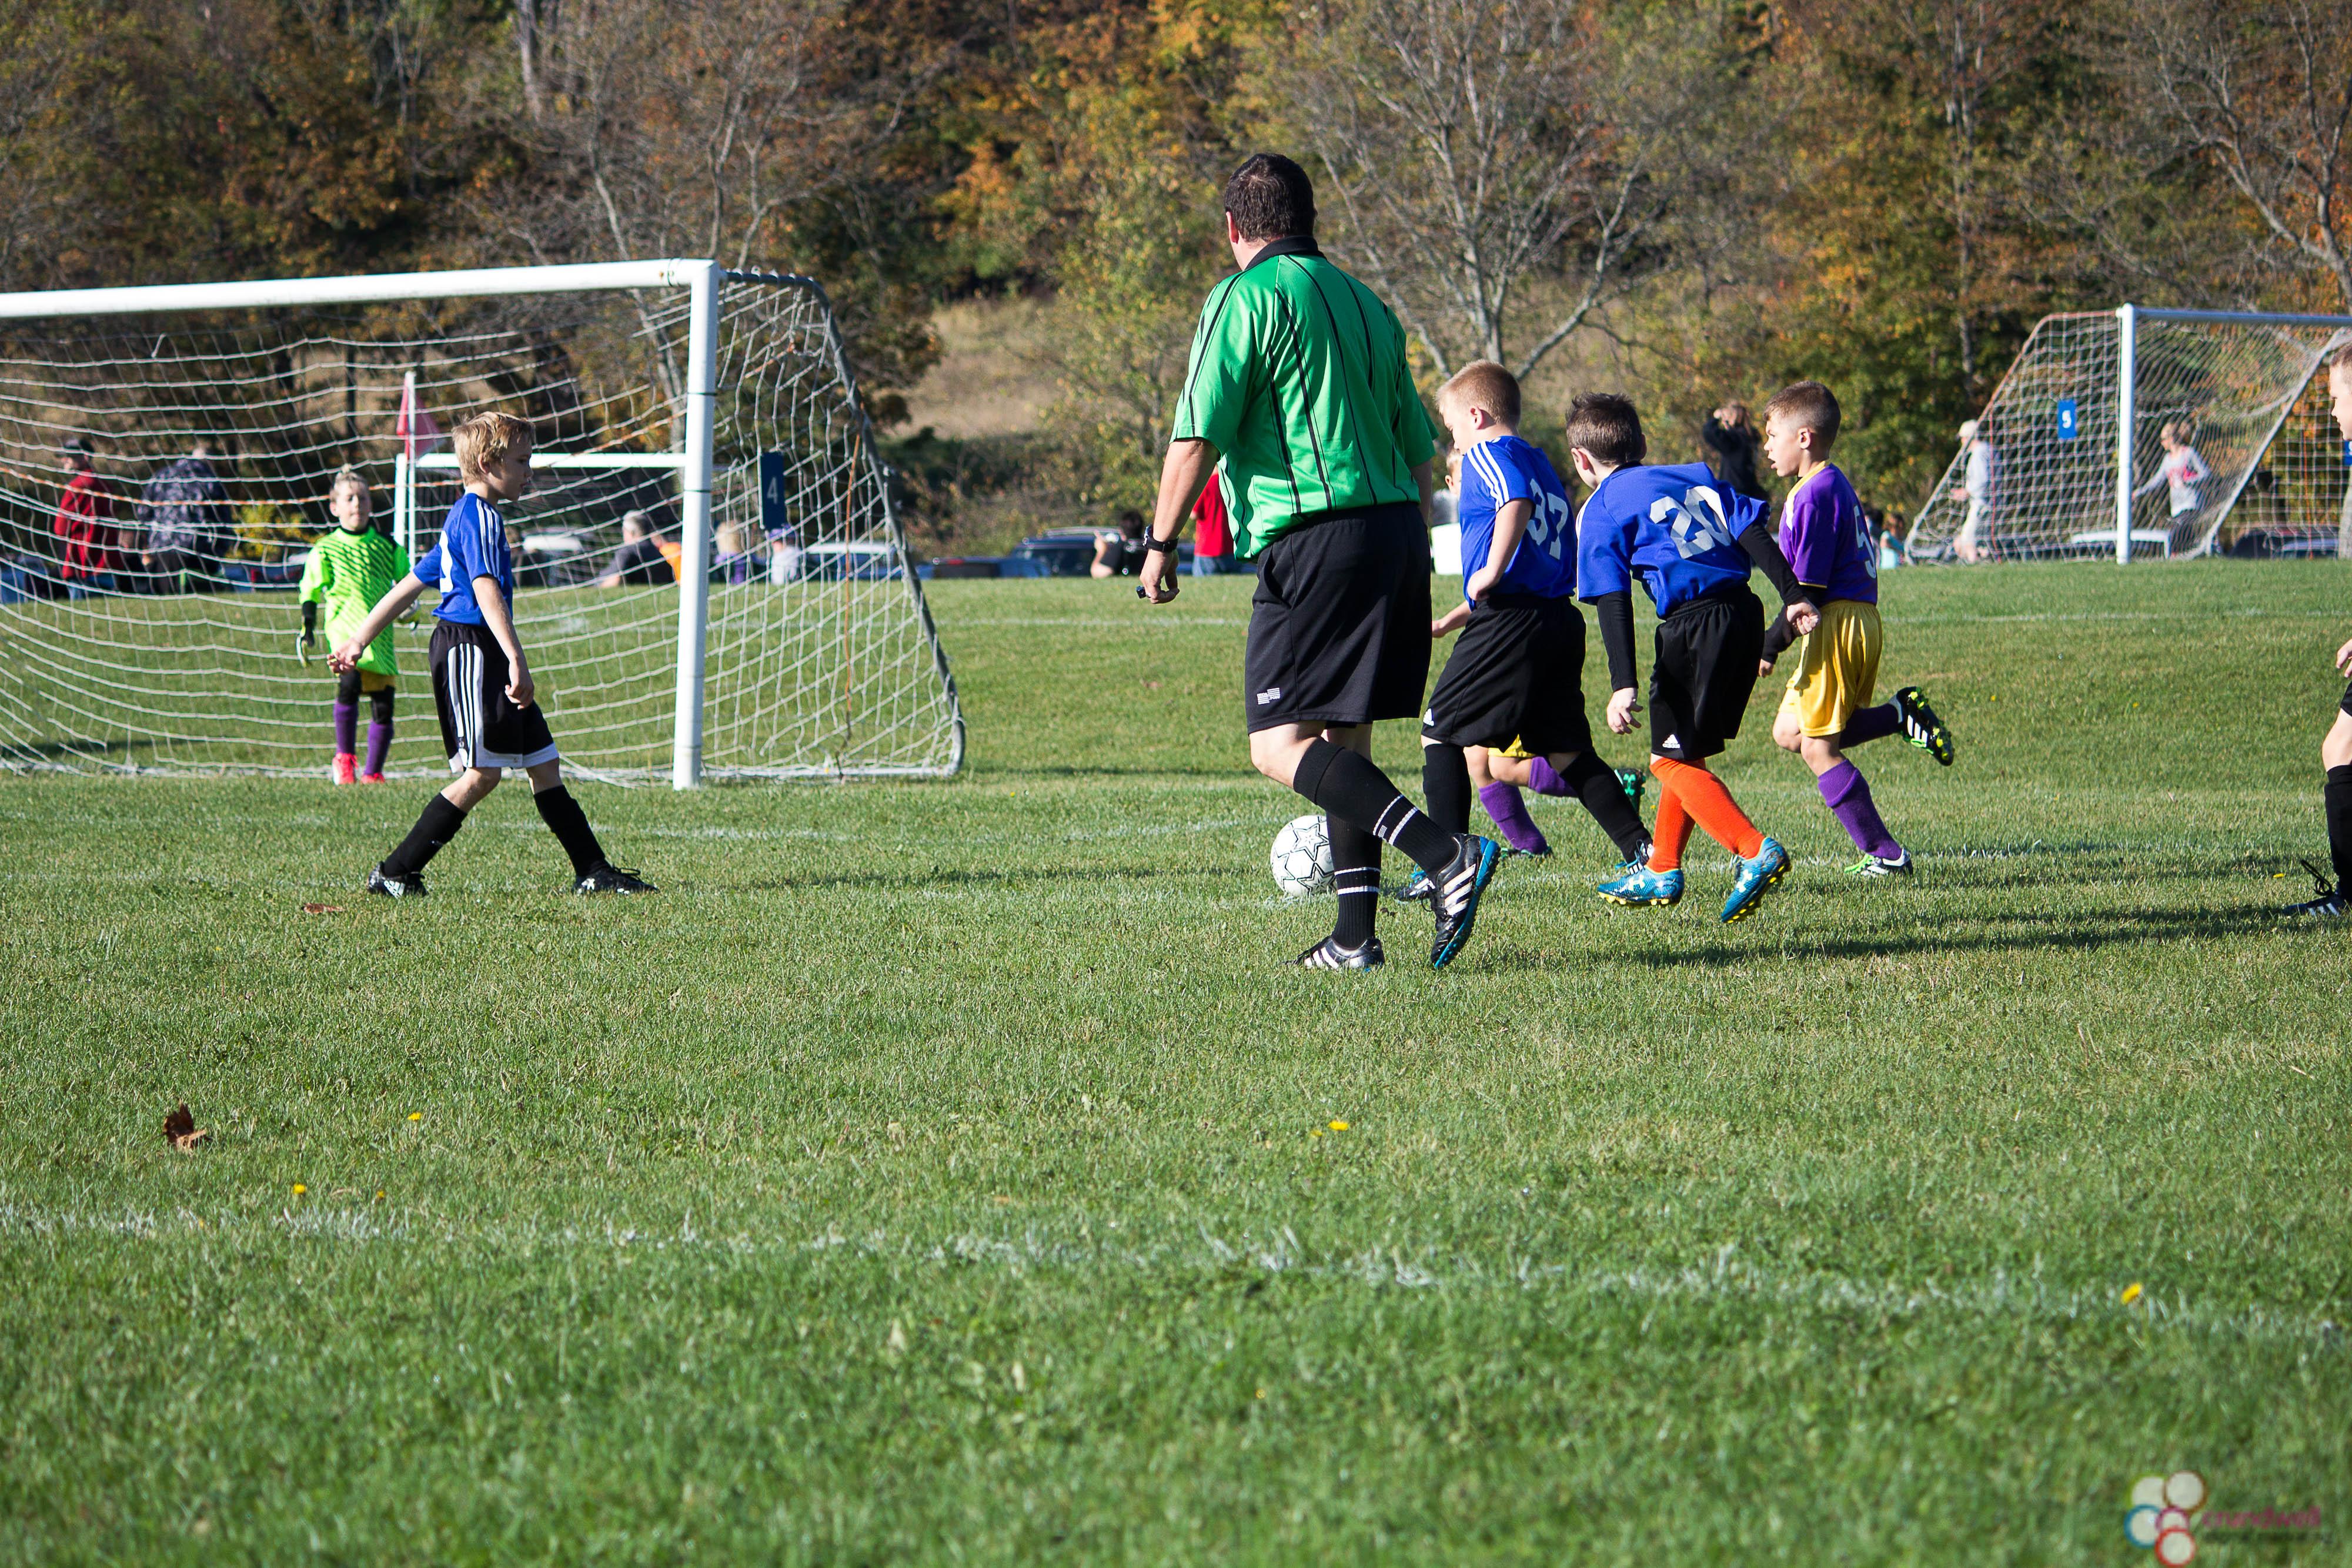 2017-10-14-Spartan-U9-Soccer-Final (16 of 134)